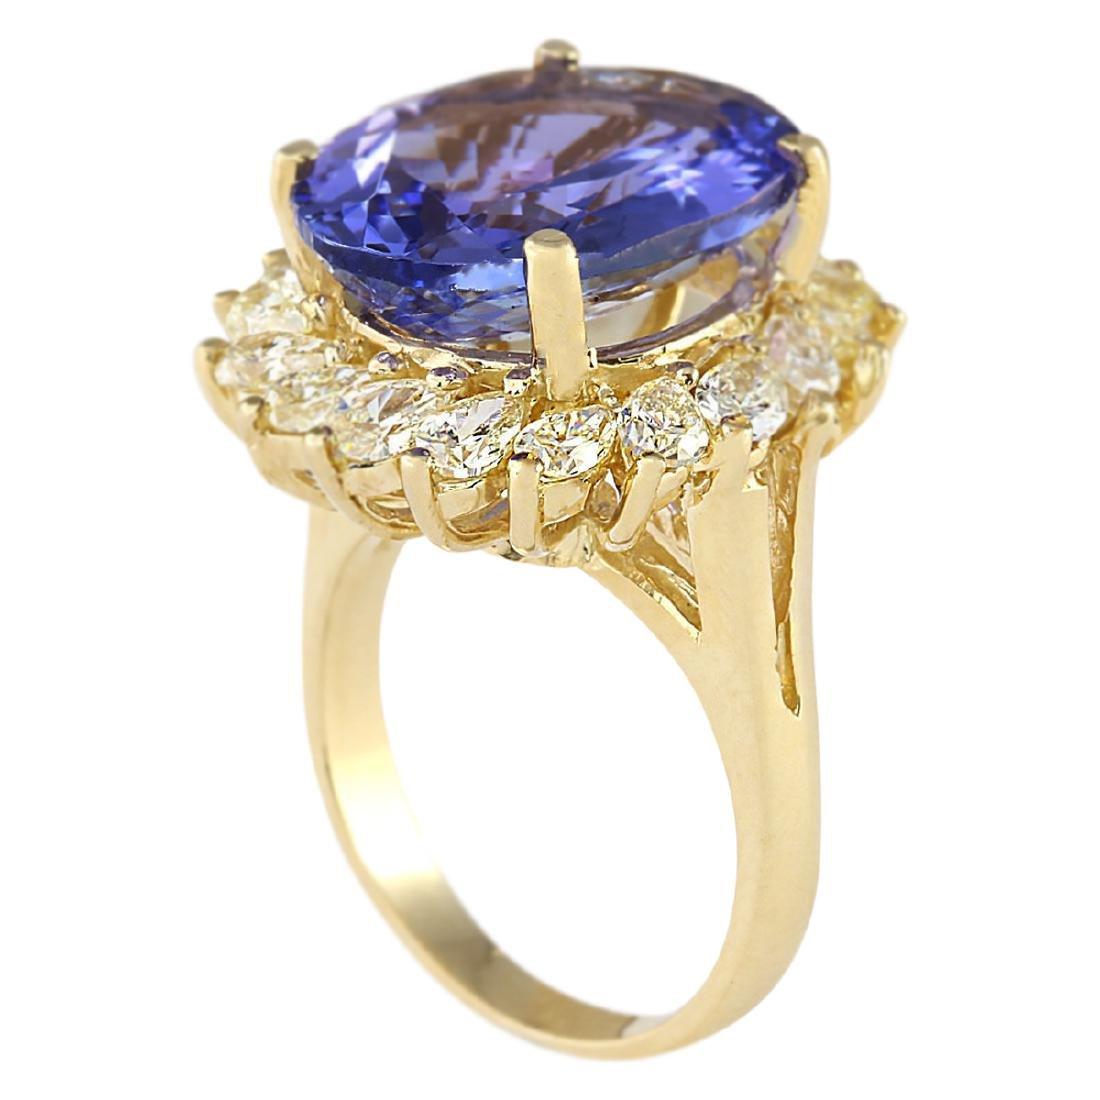 11.97 CTW Natural Tanzanite And Diamond Ring In 18K - 3